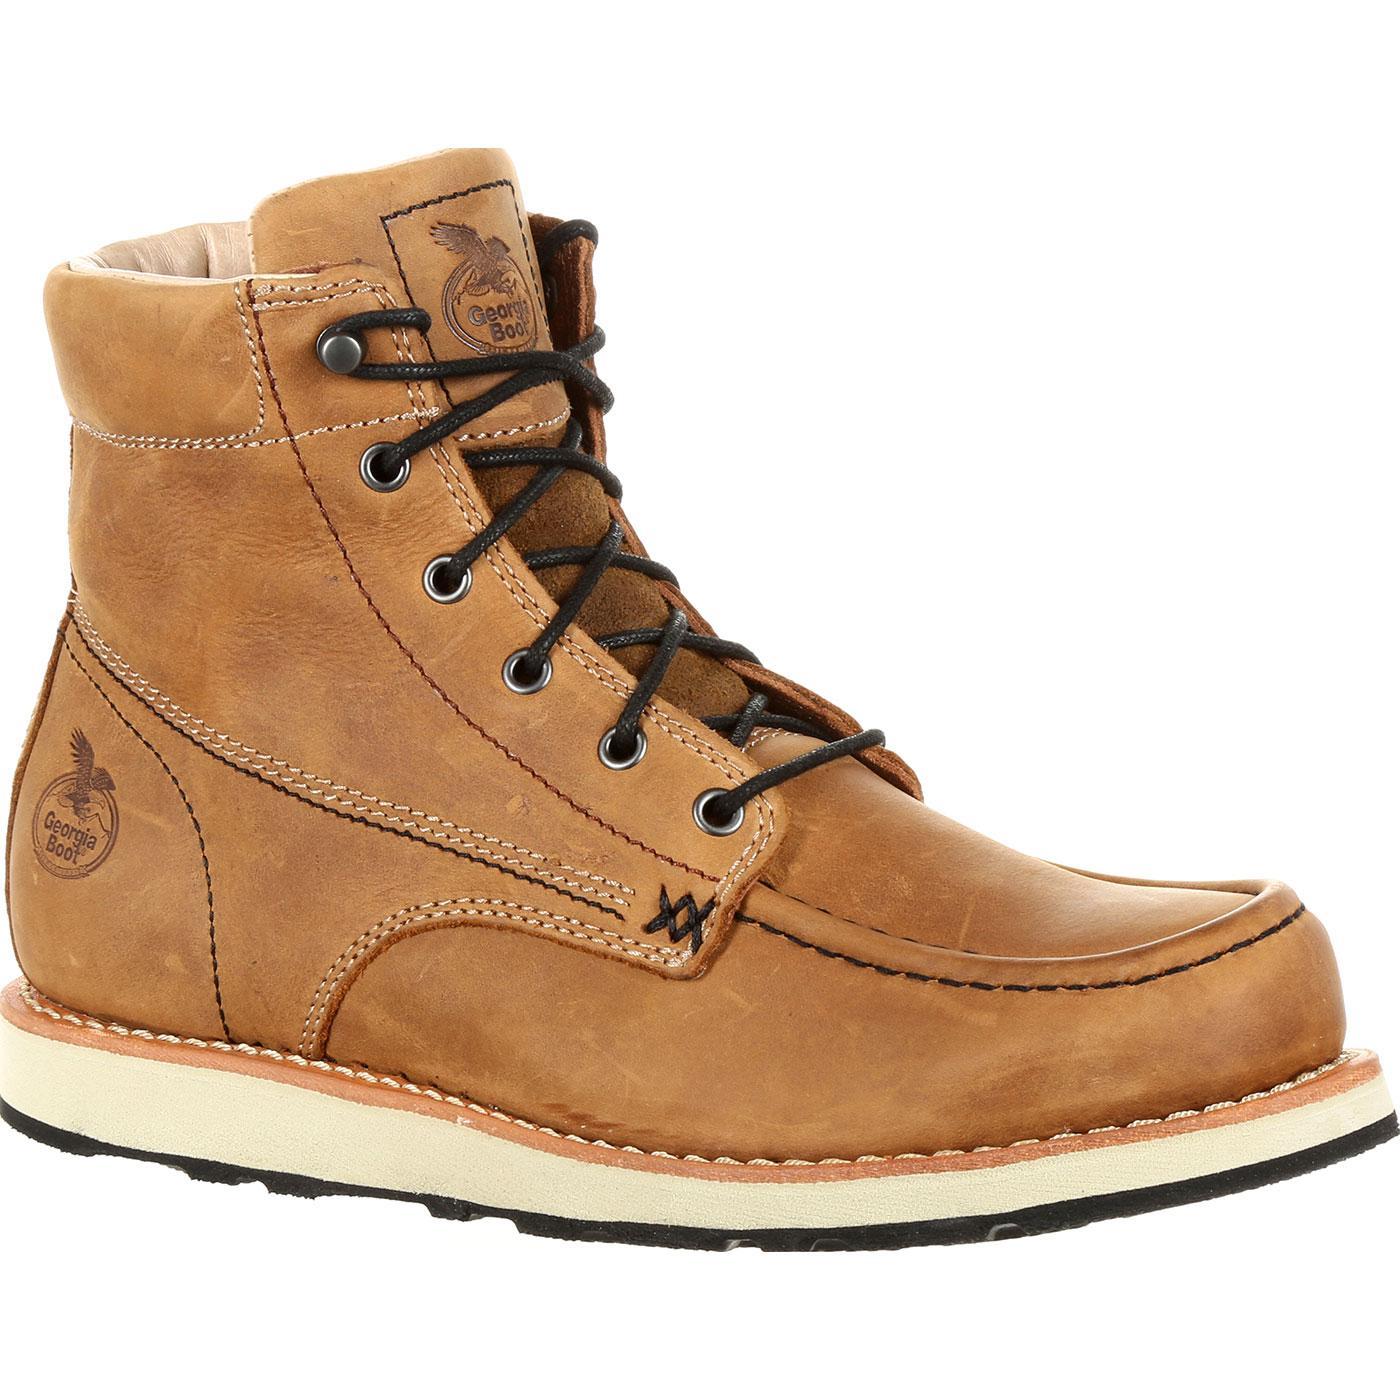 d65335256eb2 Georgia Boot Small Batch Wedge Brown Boot